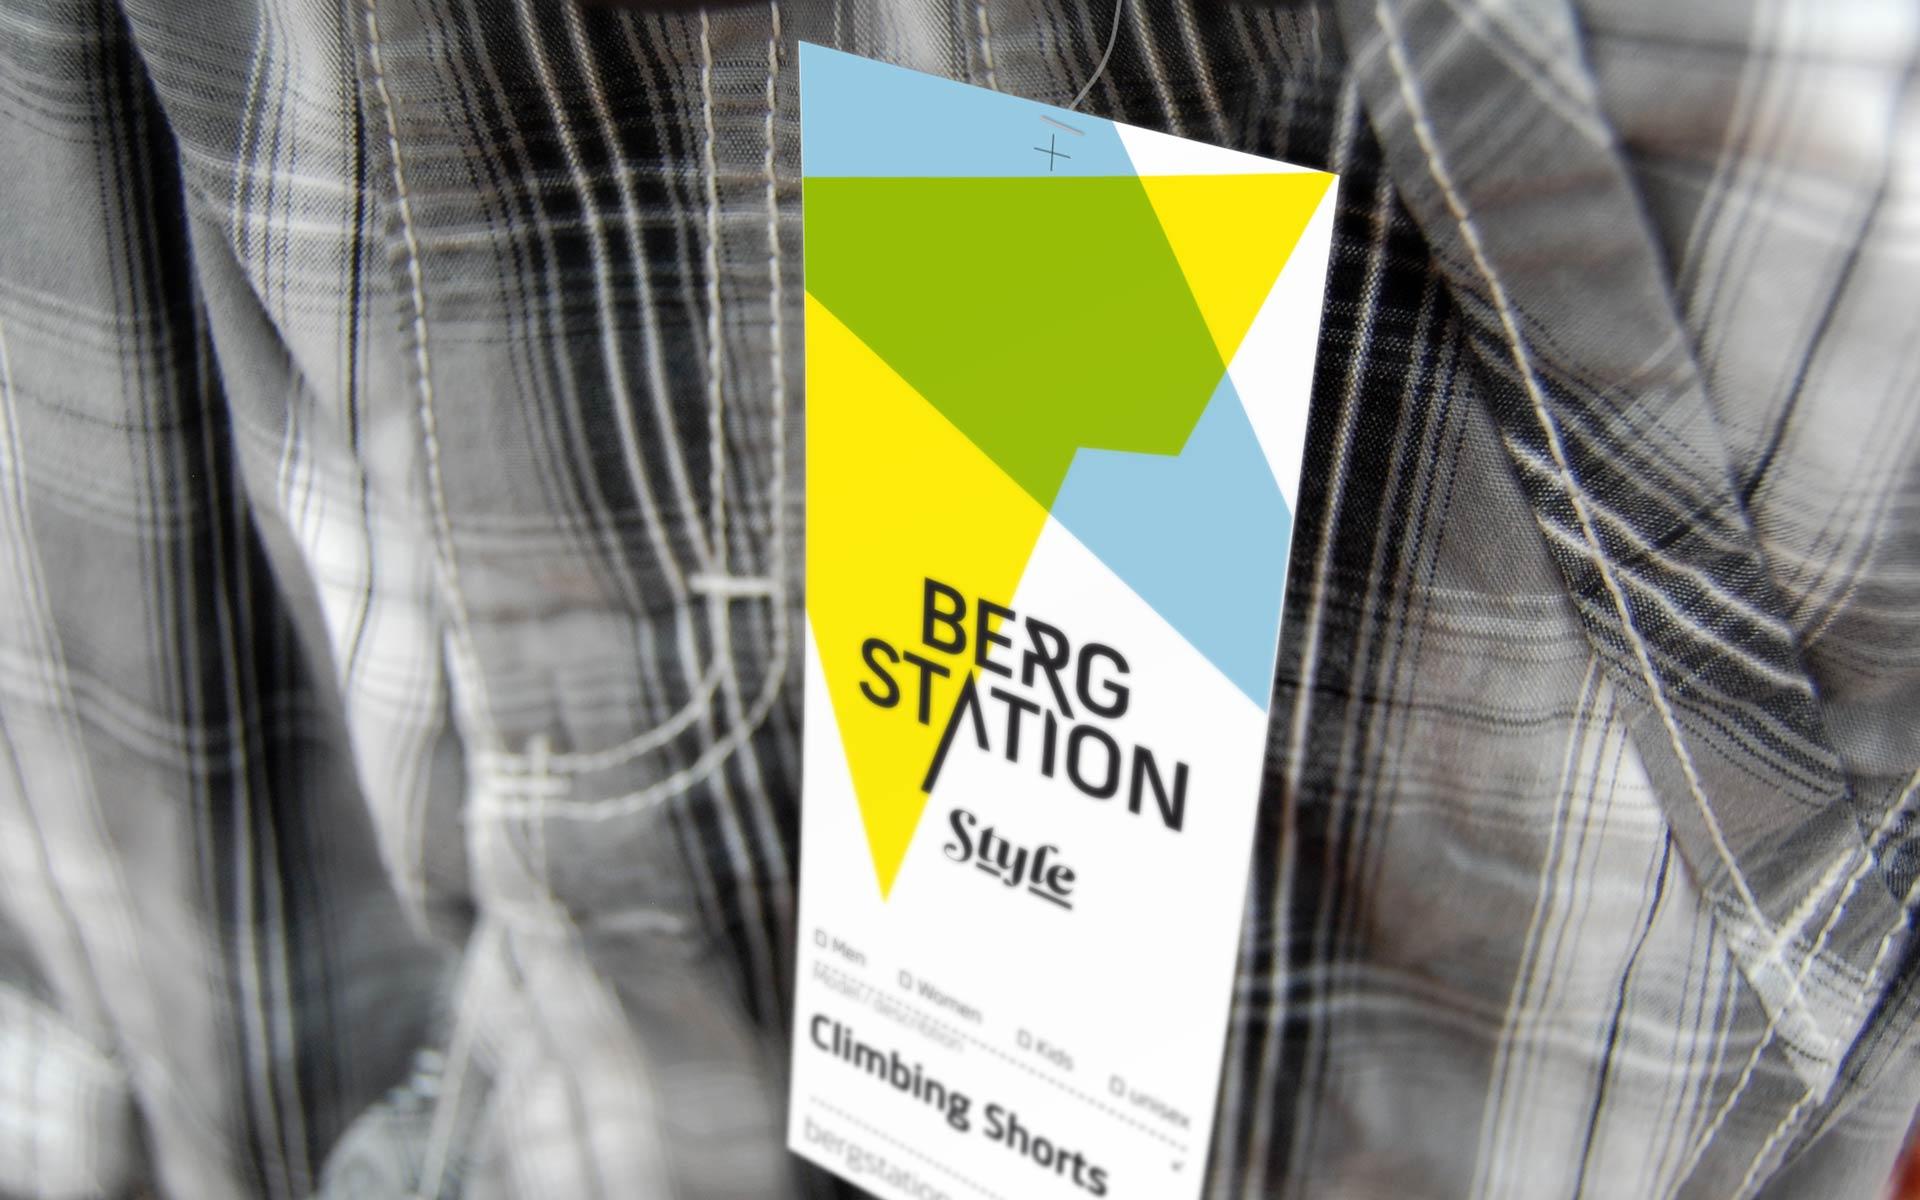 Bergstation Corporate Design, Hangtag, Corporate Fashion, Bekleidungslinie